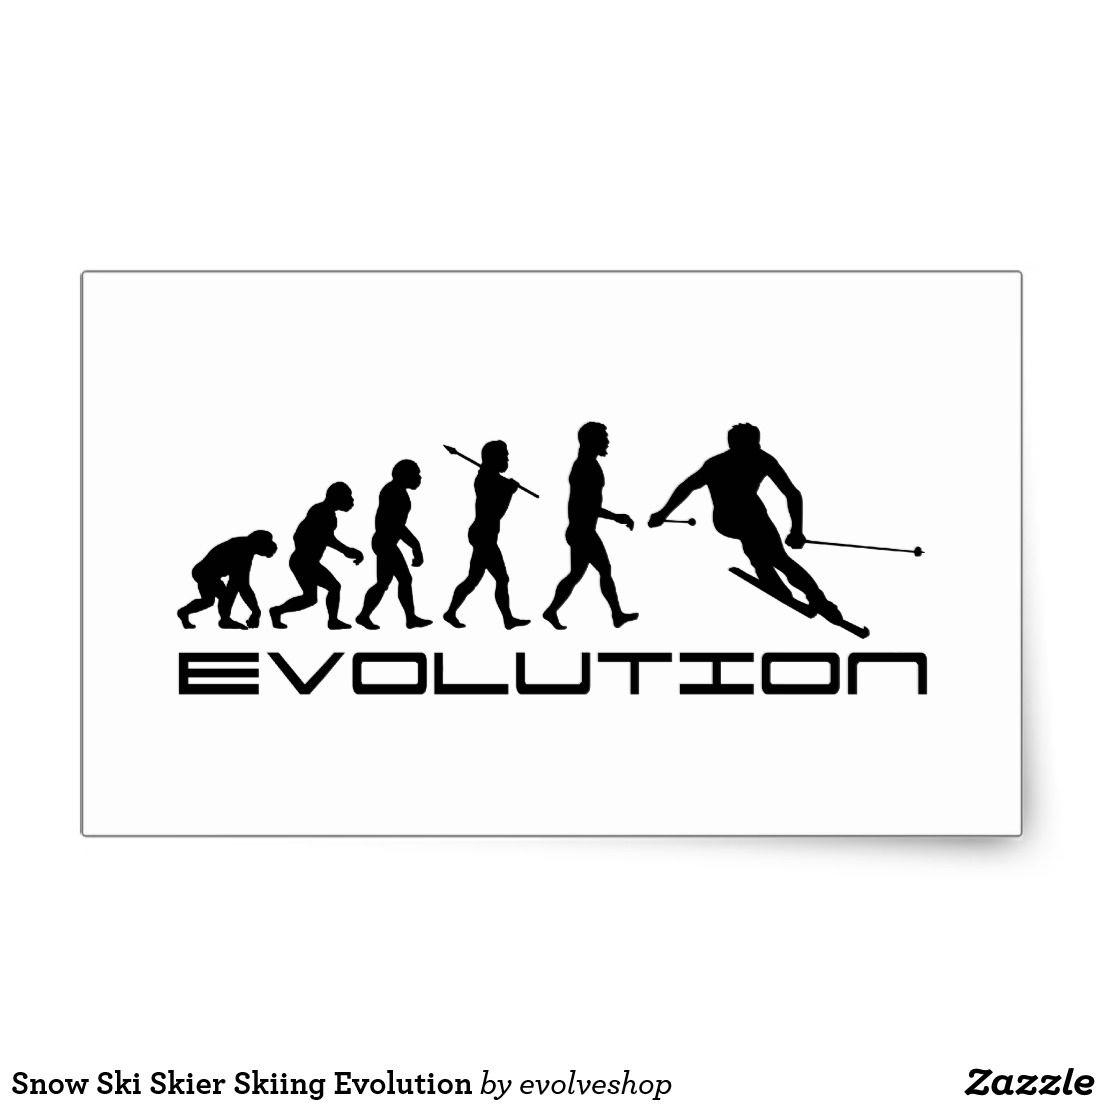 Snow Ski Skier Skiing Evolution Classic Sticker Ski Stickers Work Stickers Snow Skiing Skier [ 1106 x 1106 Pixel ]